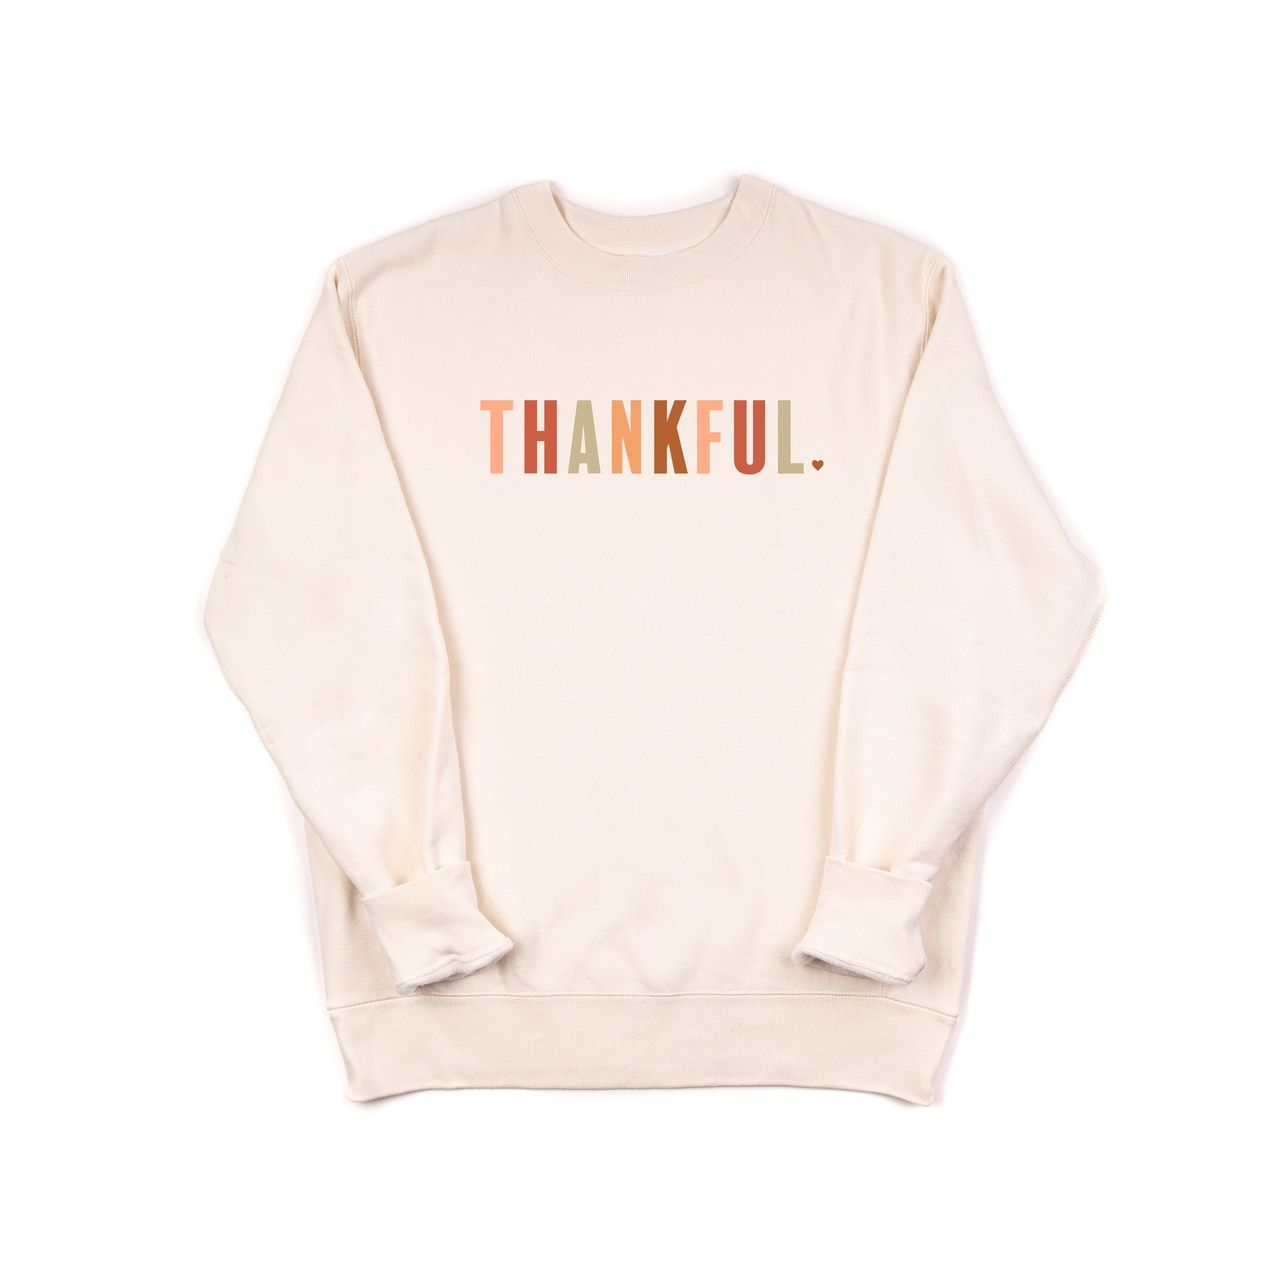 Thankful Multi Color Premium Cozy Heavyweight Sweatshirt In 2021 Sweatshirts Workout Sweatshirt Crew Neck Sweatshirt [ 1280 x 1280 Pixel ]